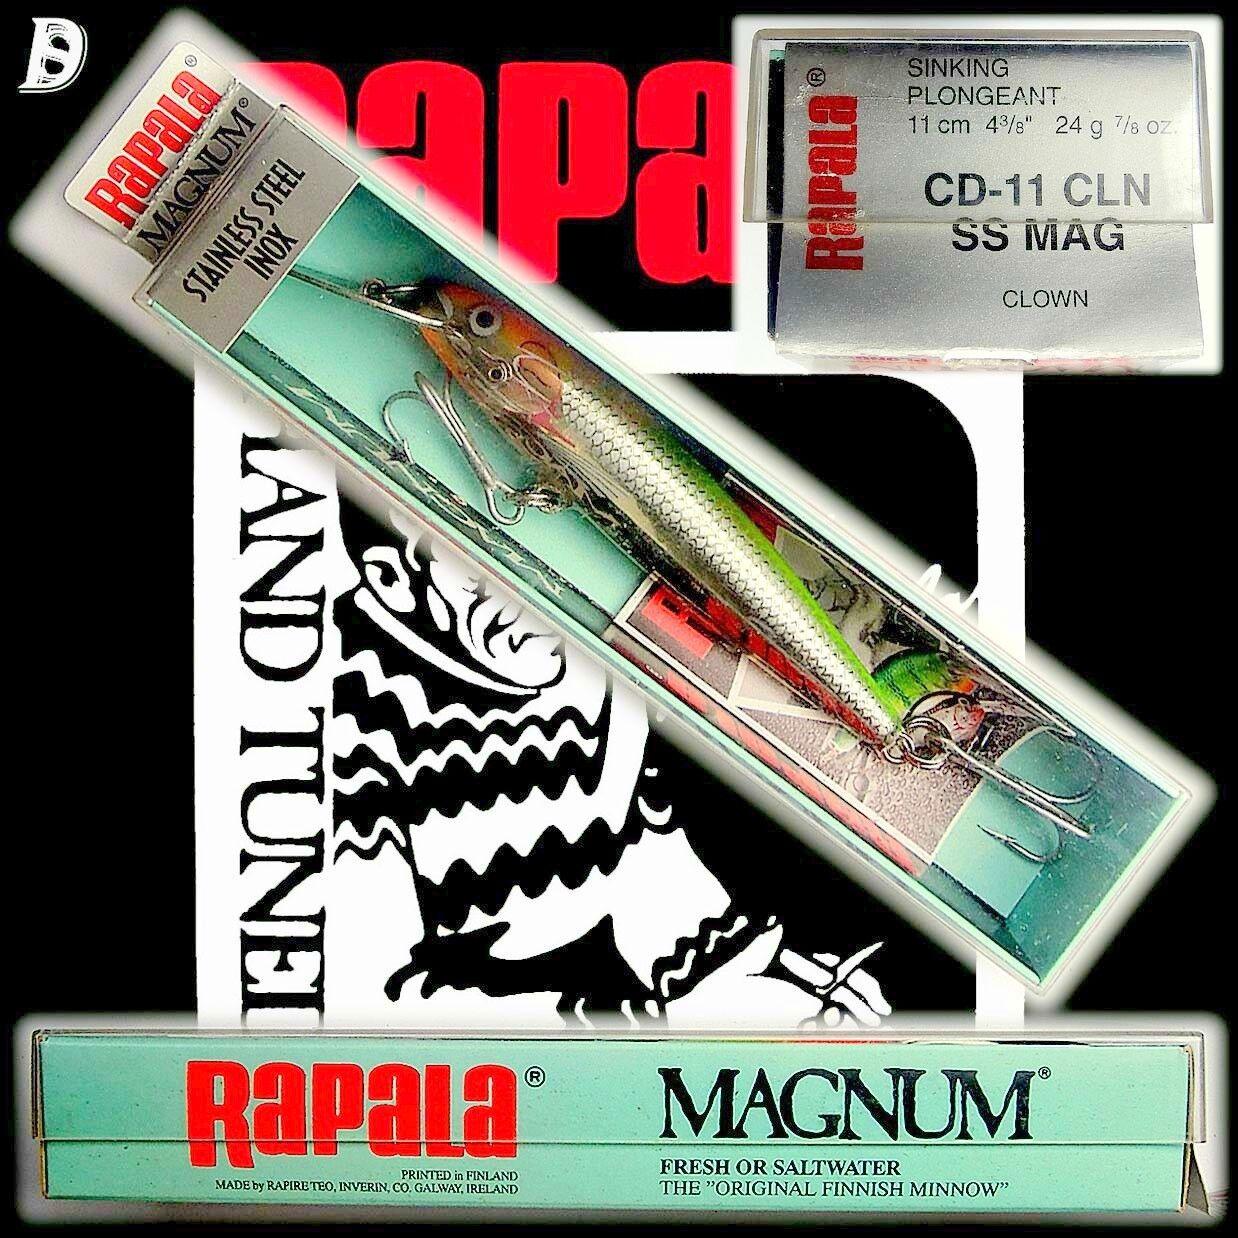 Rapala Magnum Countdown Stainless Steel 11cm SS CLN NiB Irland, sehr selten